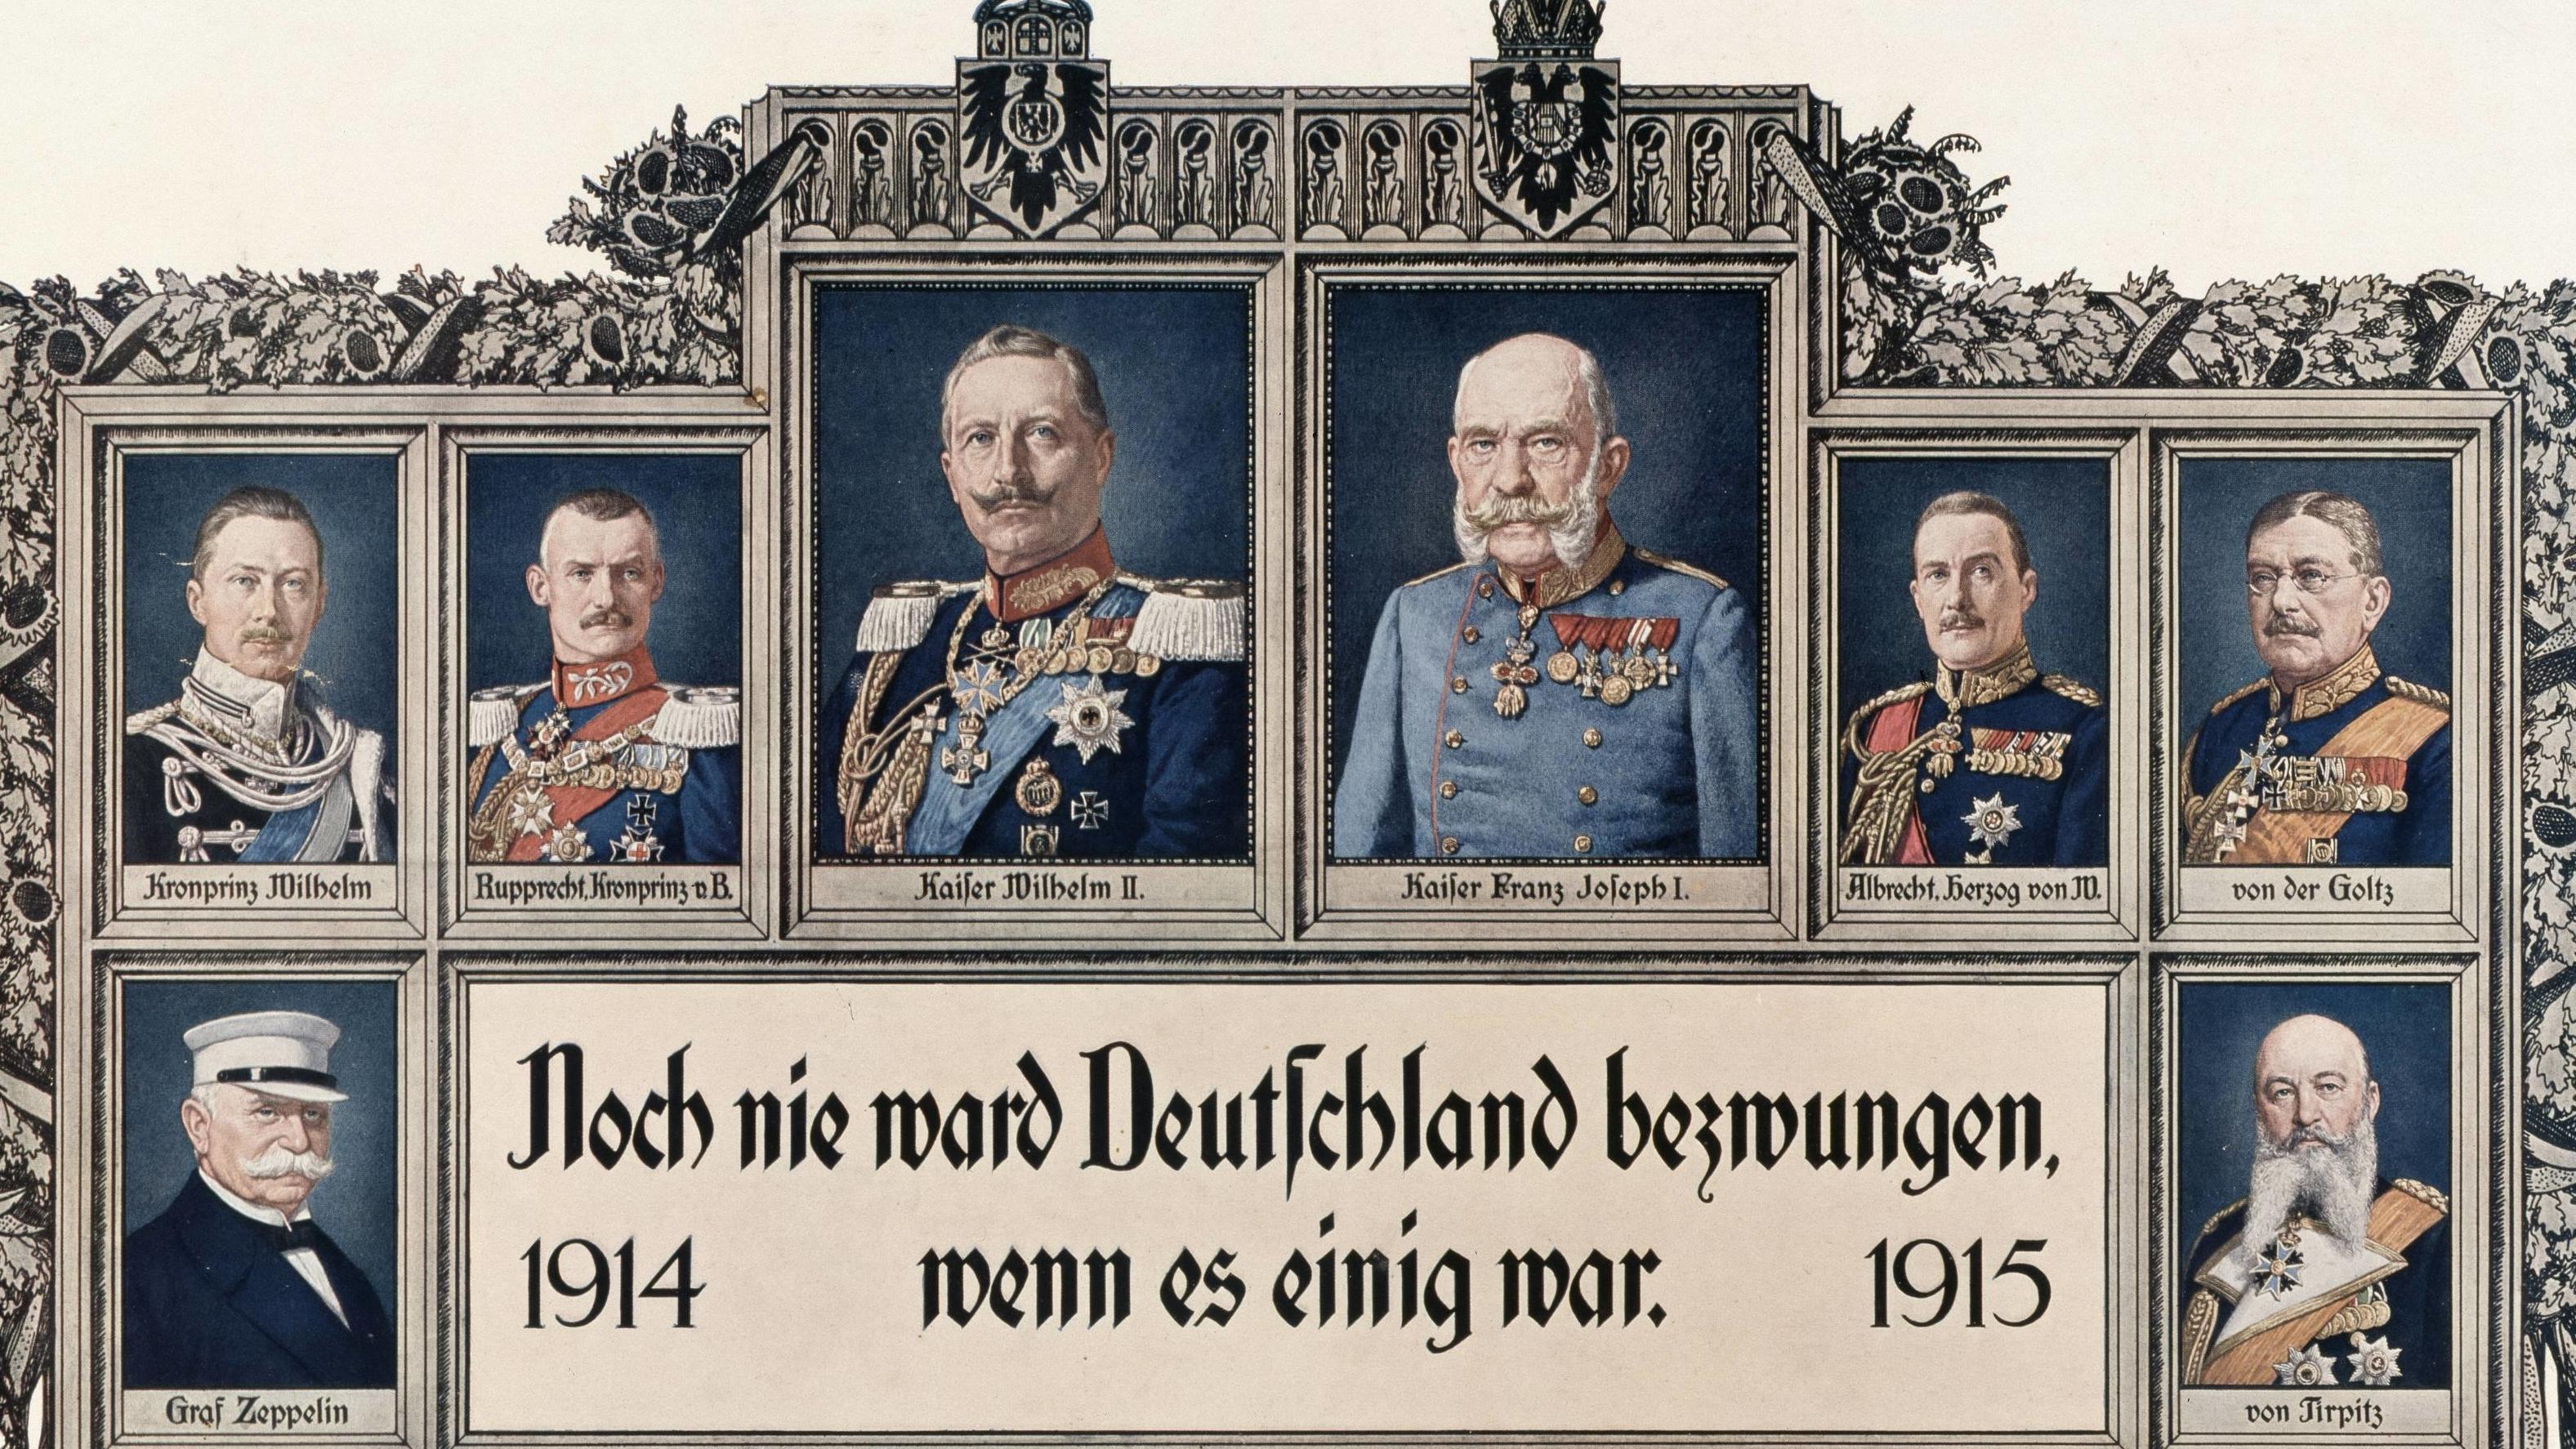 Propagandapostkarte (1915)